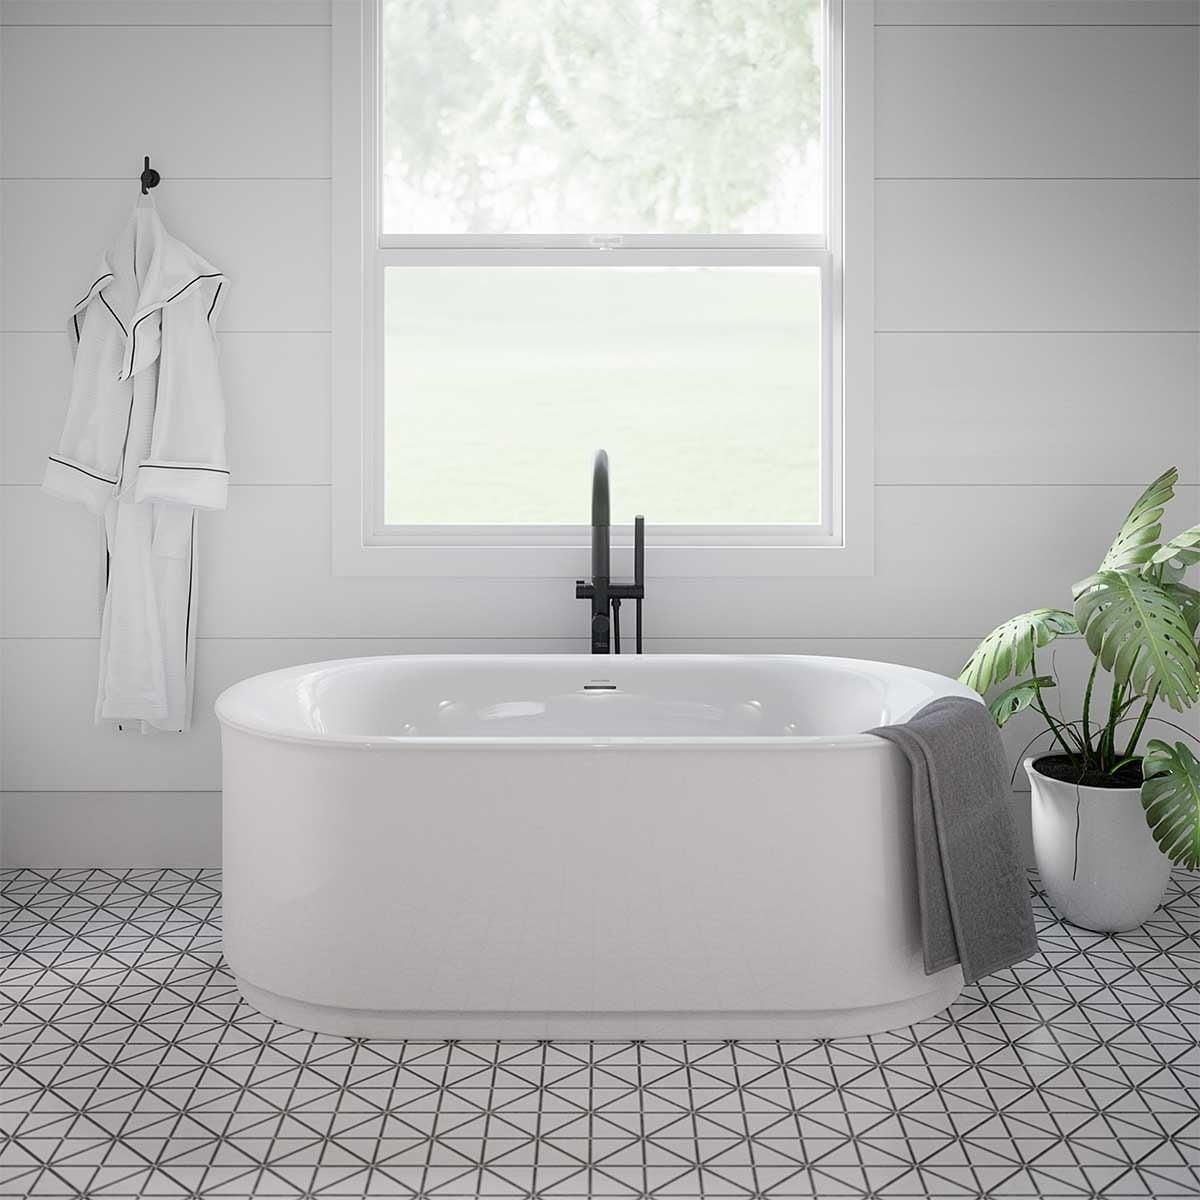 Plumbing fixture, Plant, Tap, Property, Flowerpot, White, Product, Houseplant, Bathroom, Black